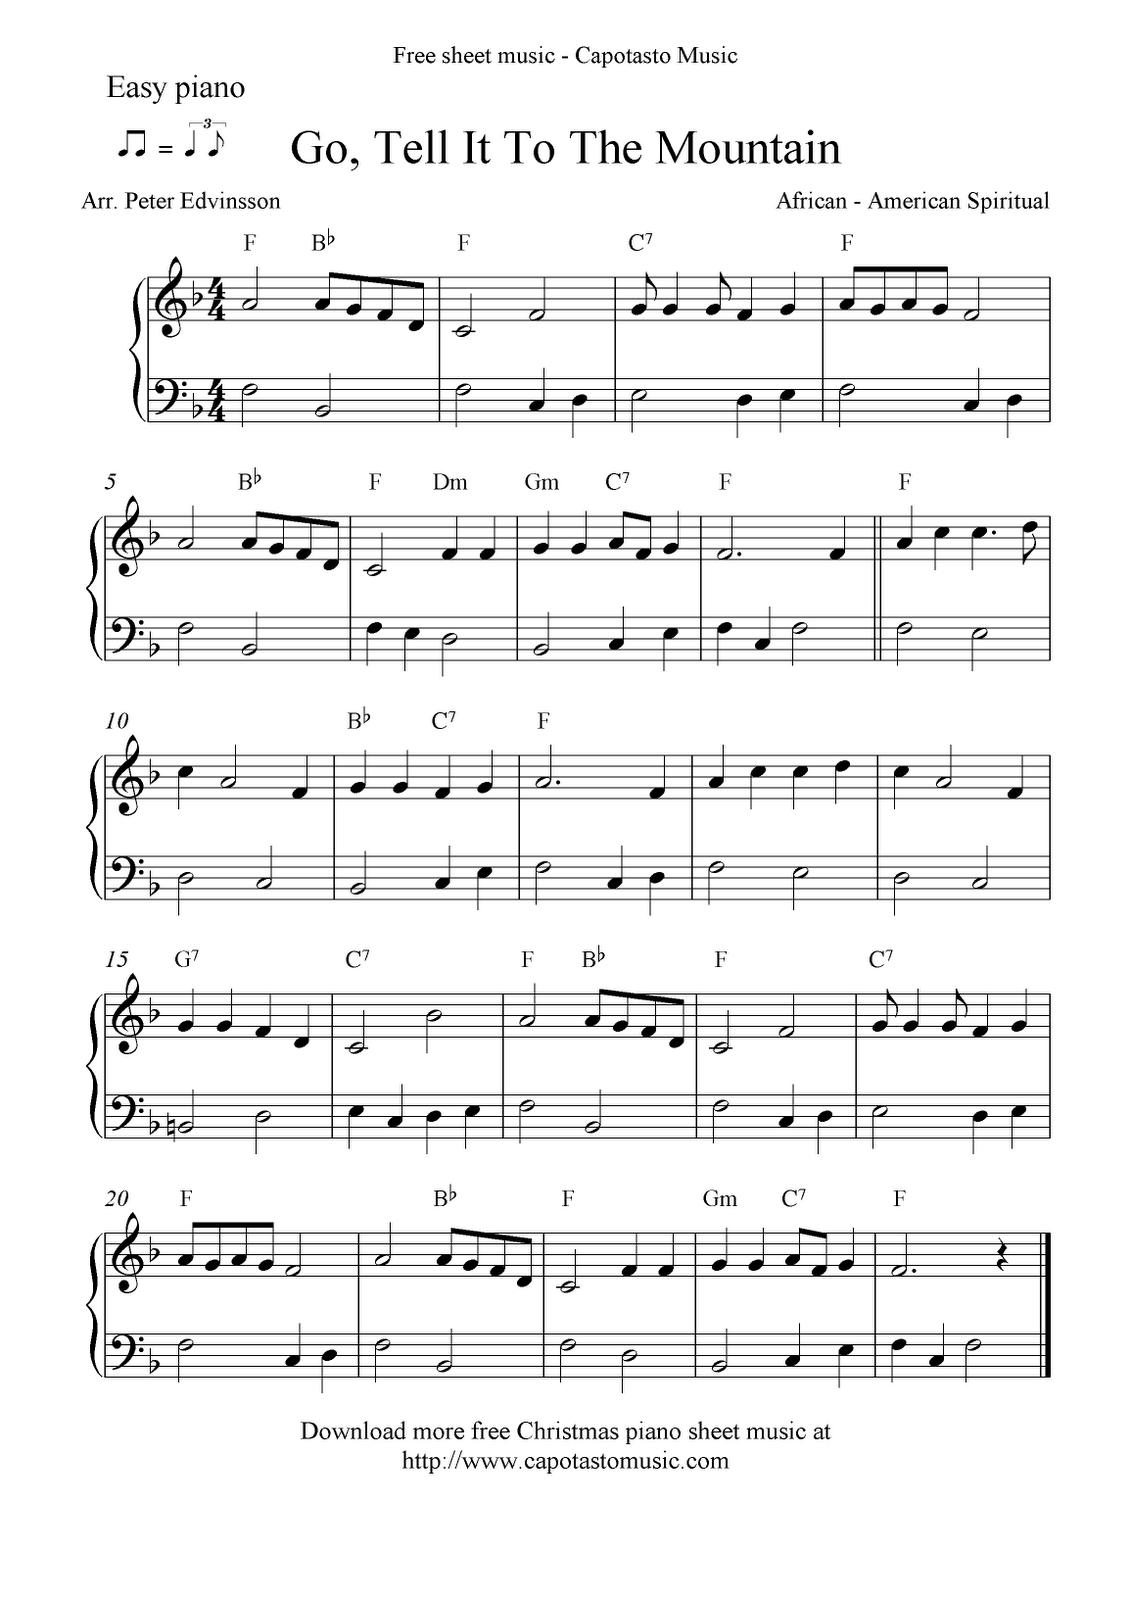 Free Printable Piano Sheet Music | Free Sheet Music Scores: Easy - Free Printable Sheet Music For Piano